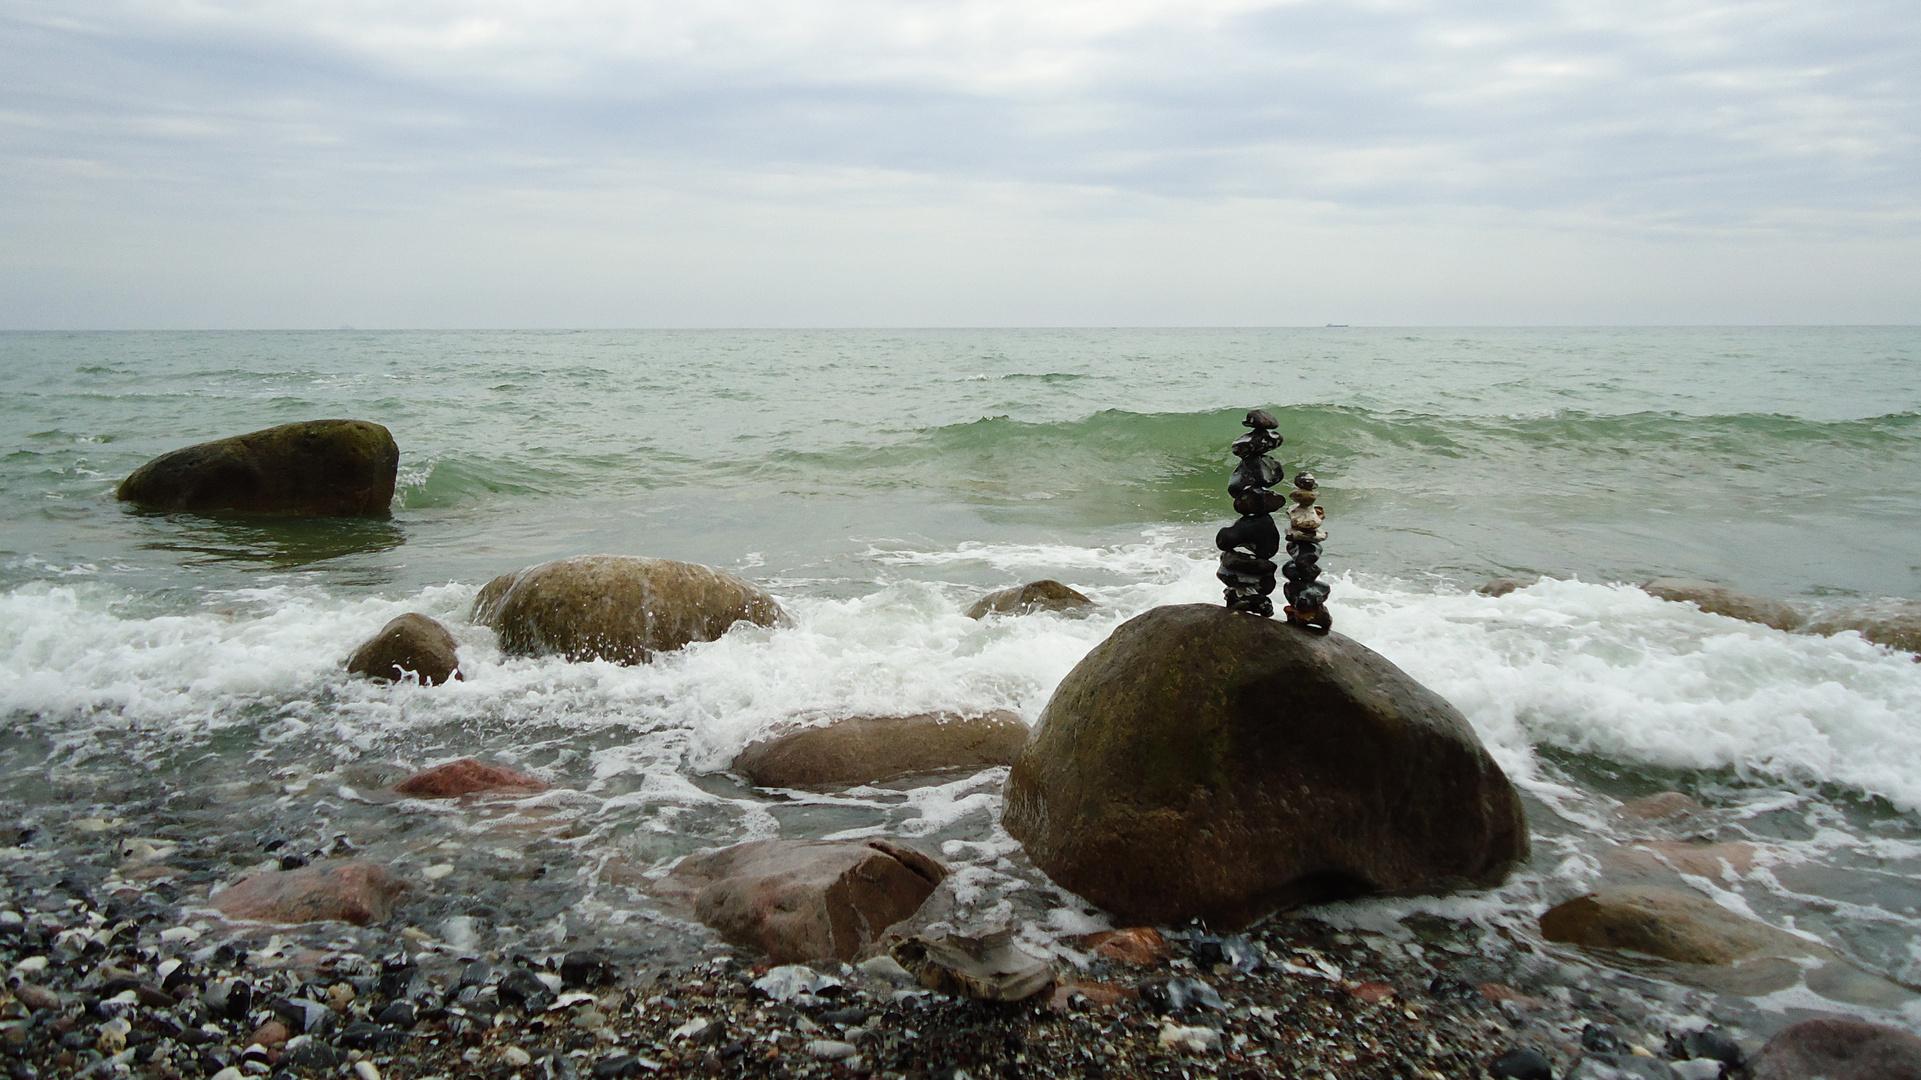 ... wir trotzen den Wellen